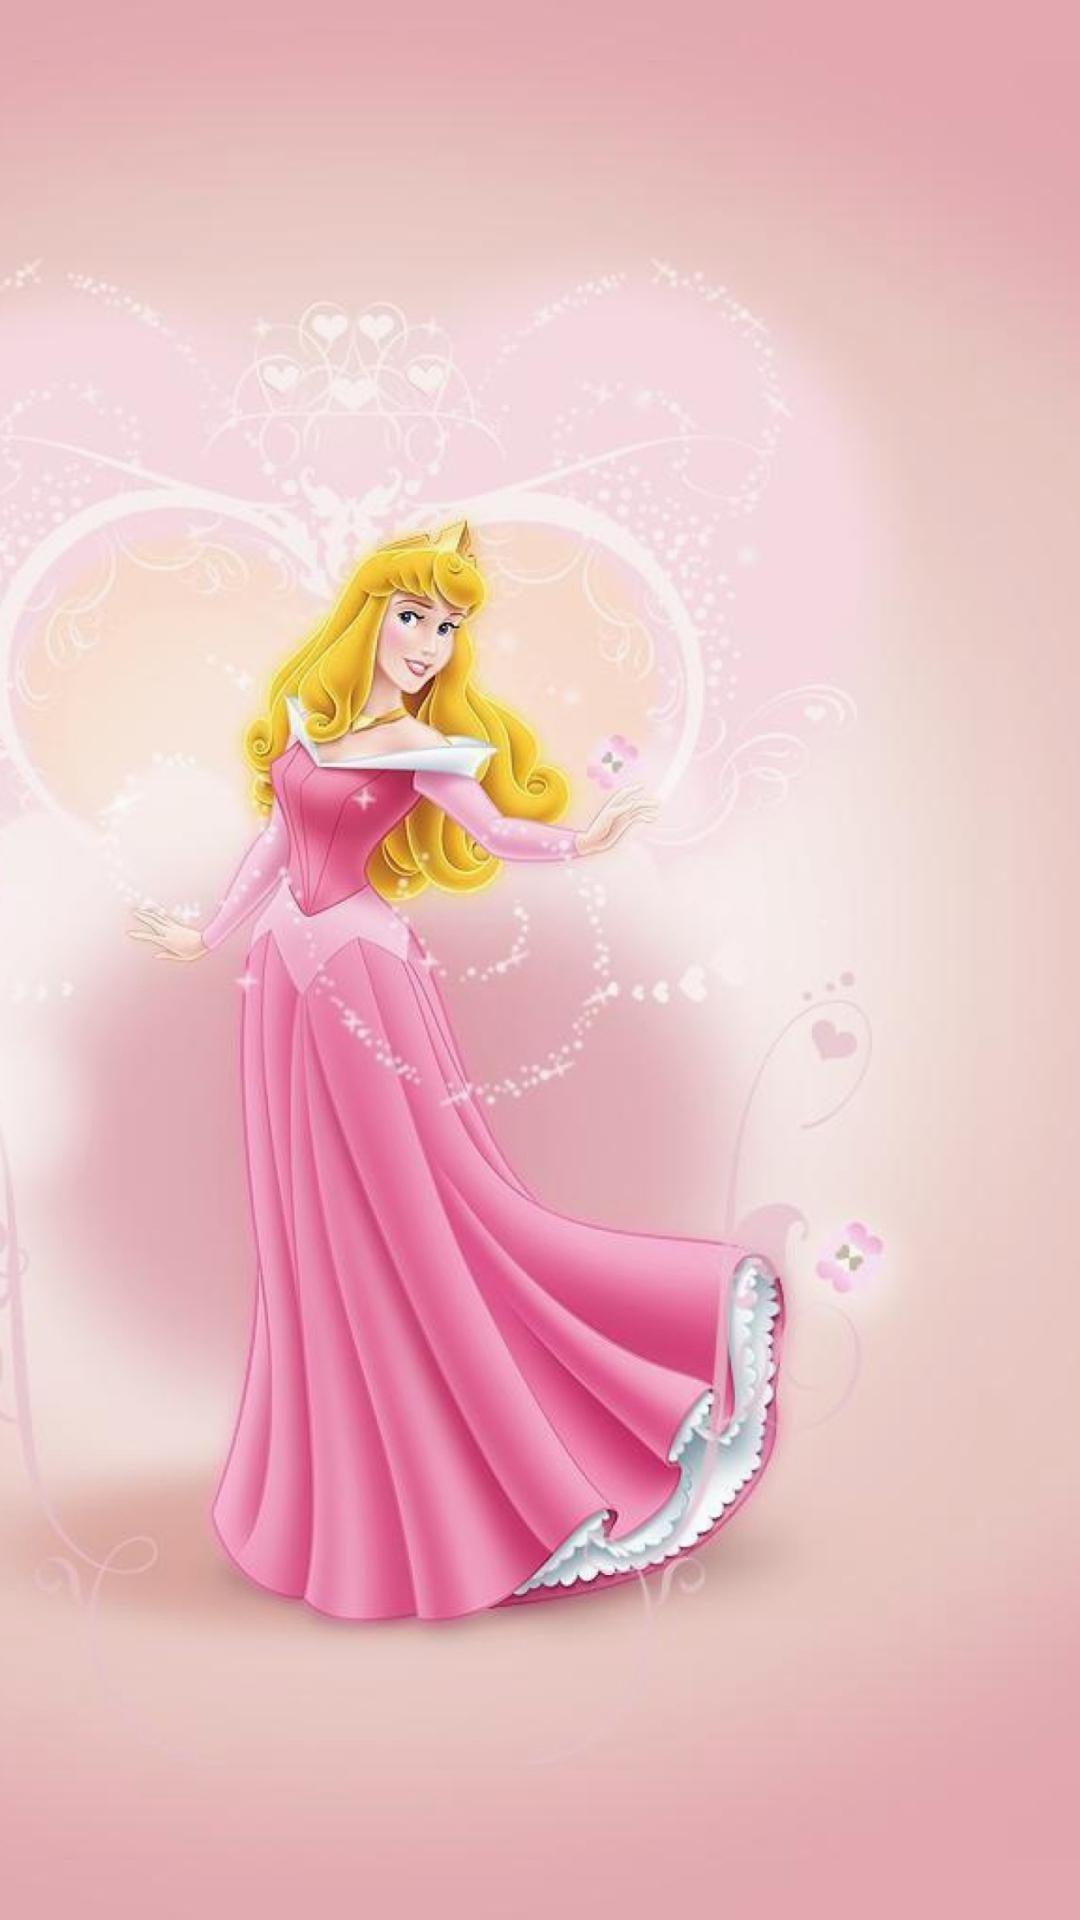 wallpaper.wiki-Princess-Aurora-Disney-Iphone-Wallpaper-PIC-